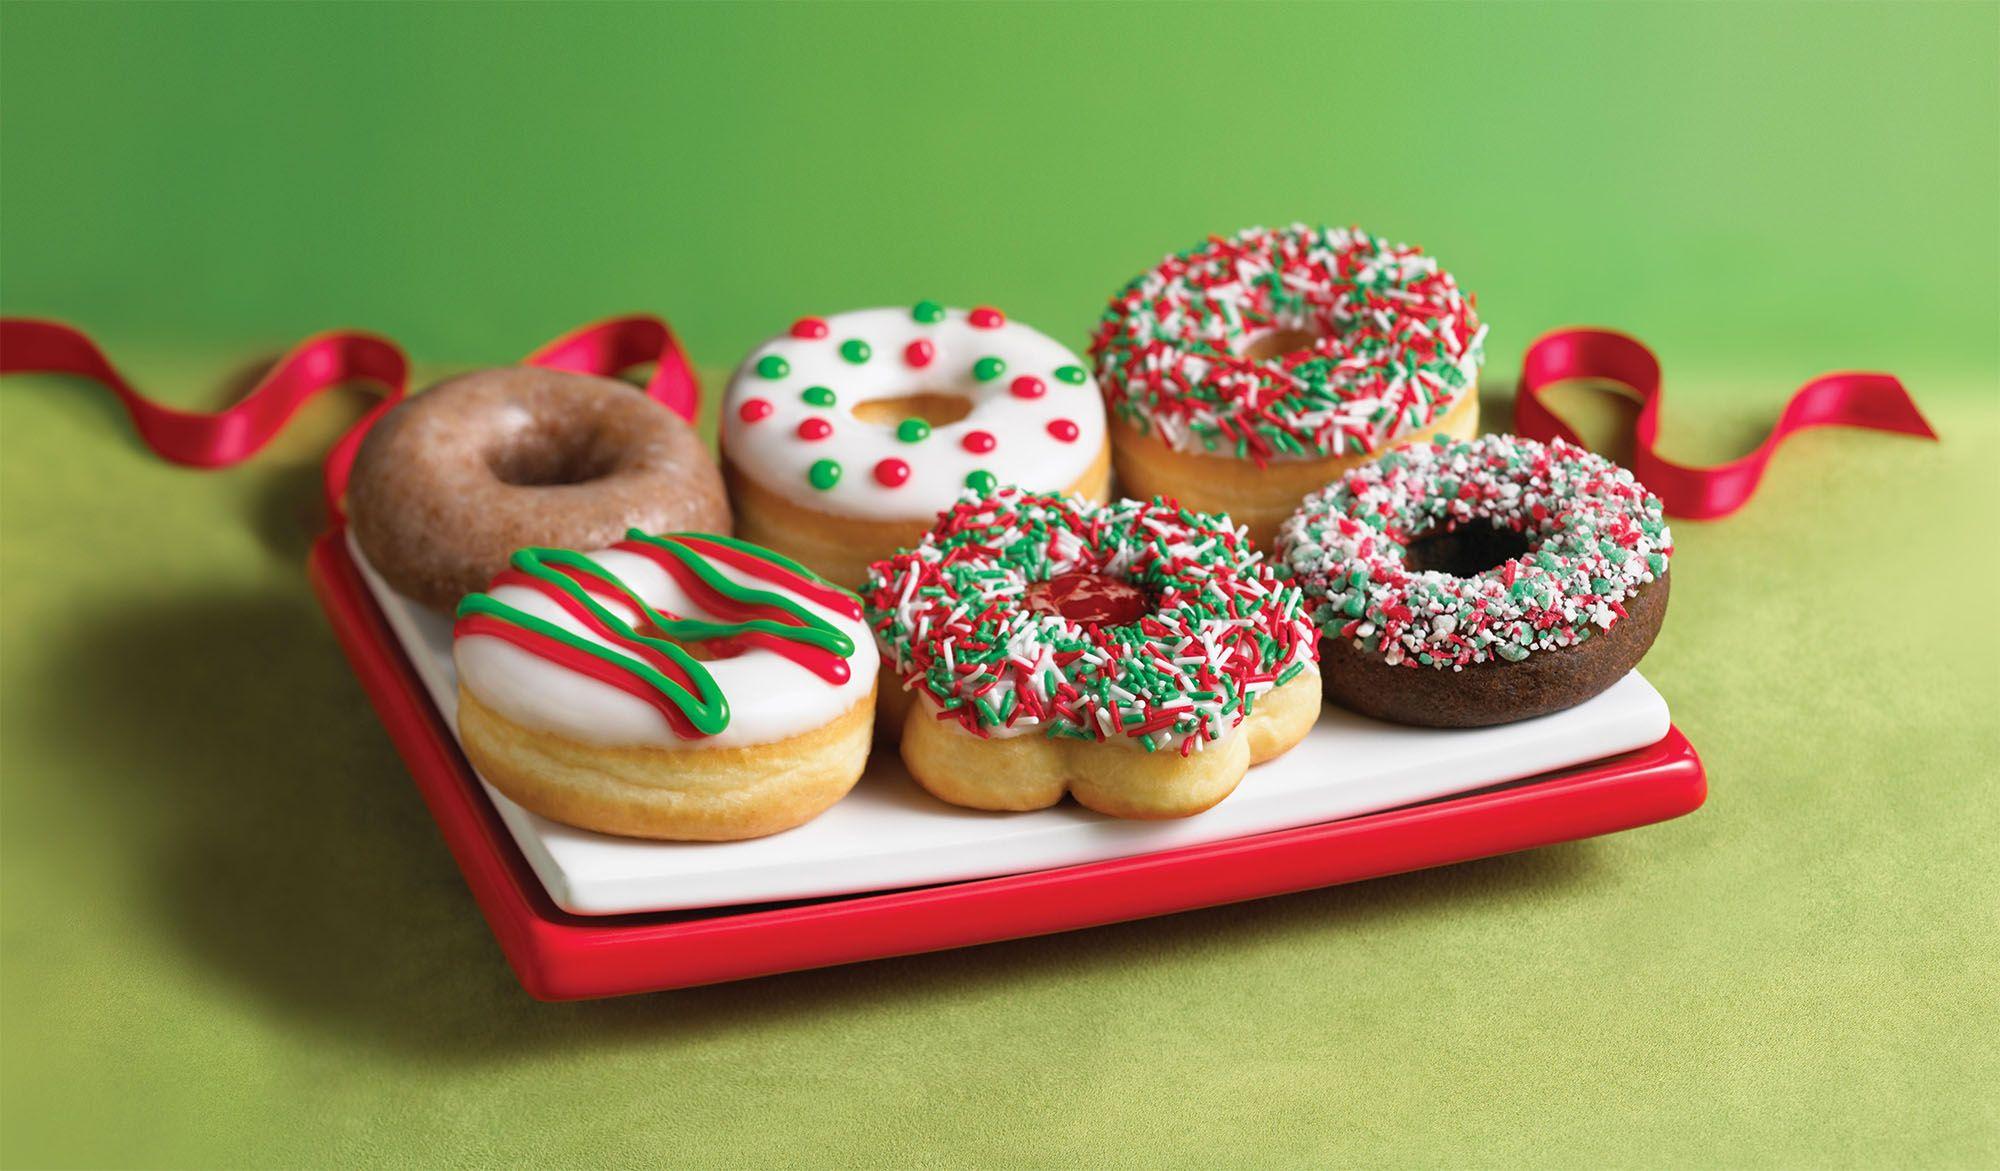 Tim Hortons Donut Shop